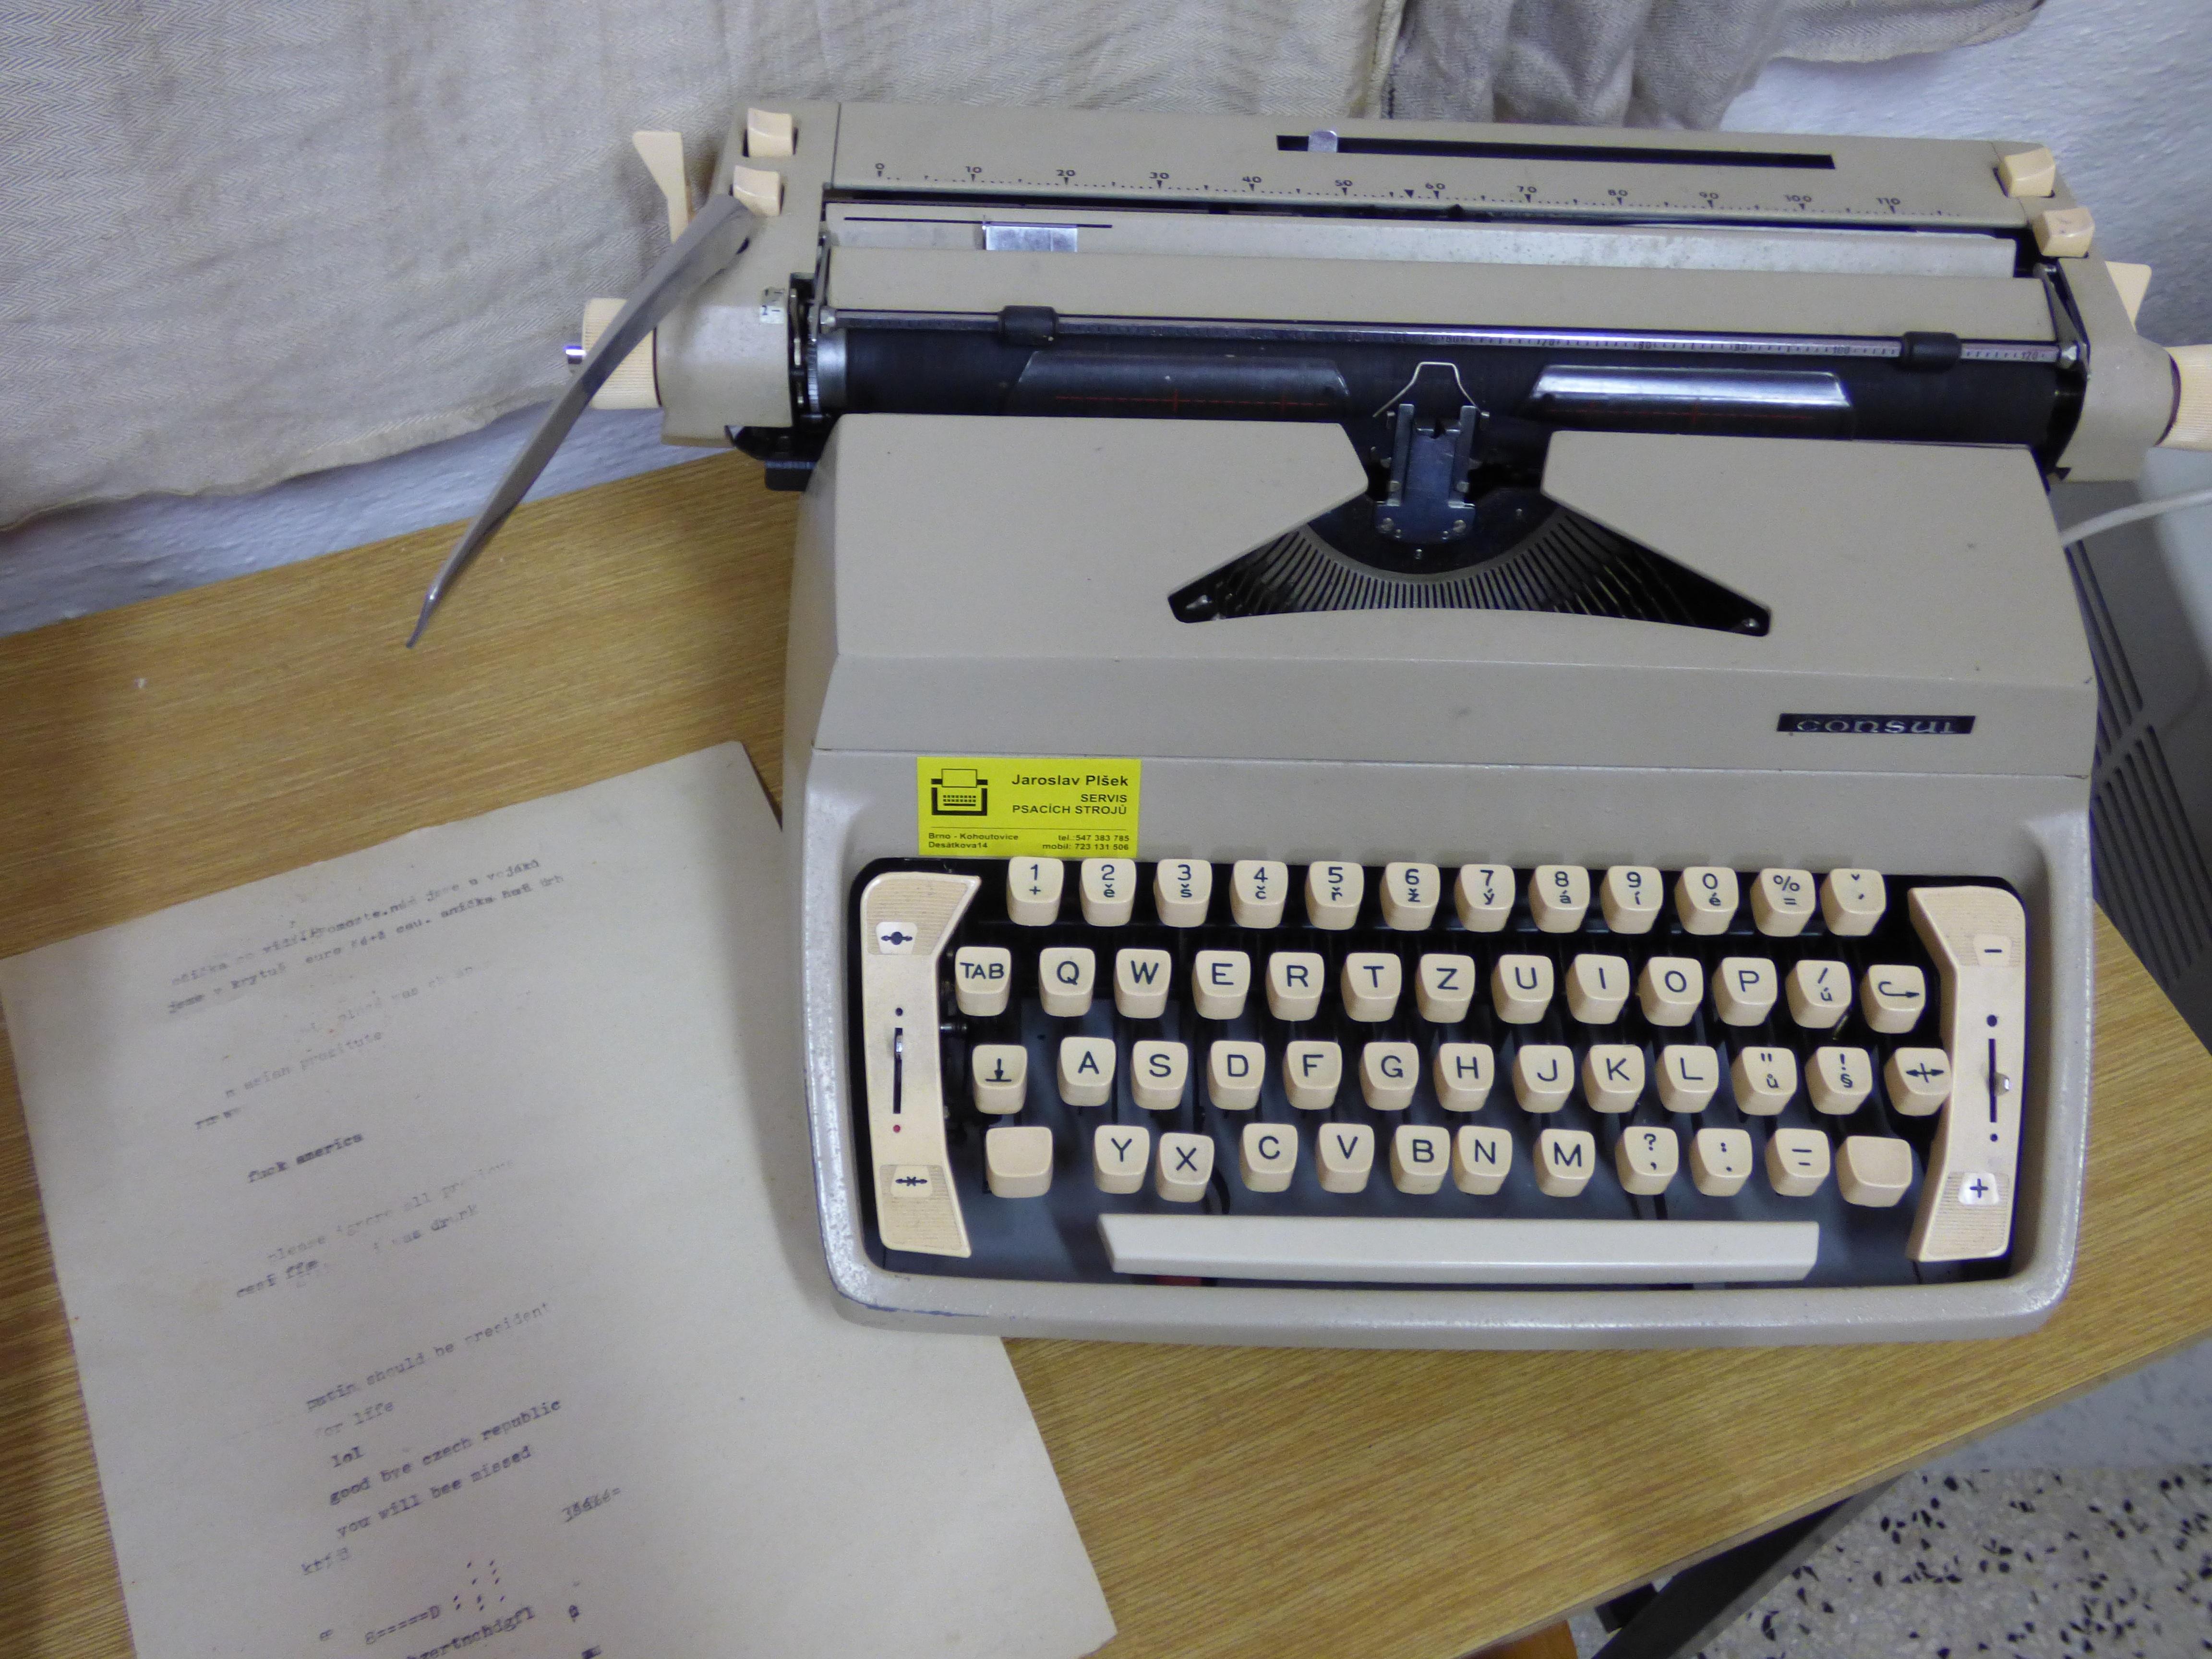 Gambar Penulisan Keyboard Retro Mesin Tik Surat Mencetak